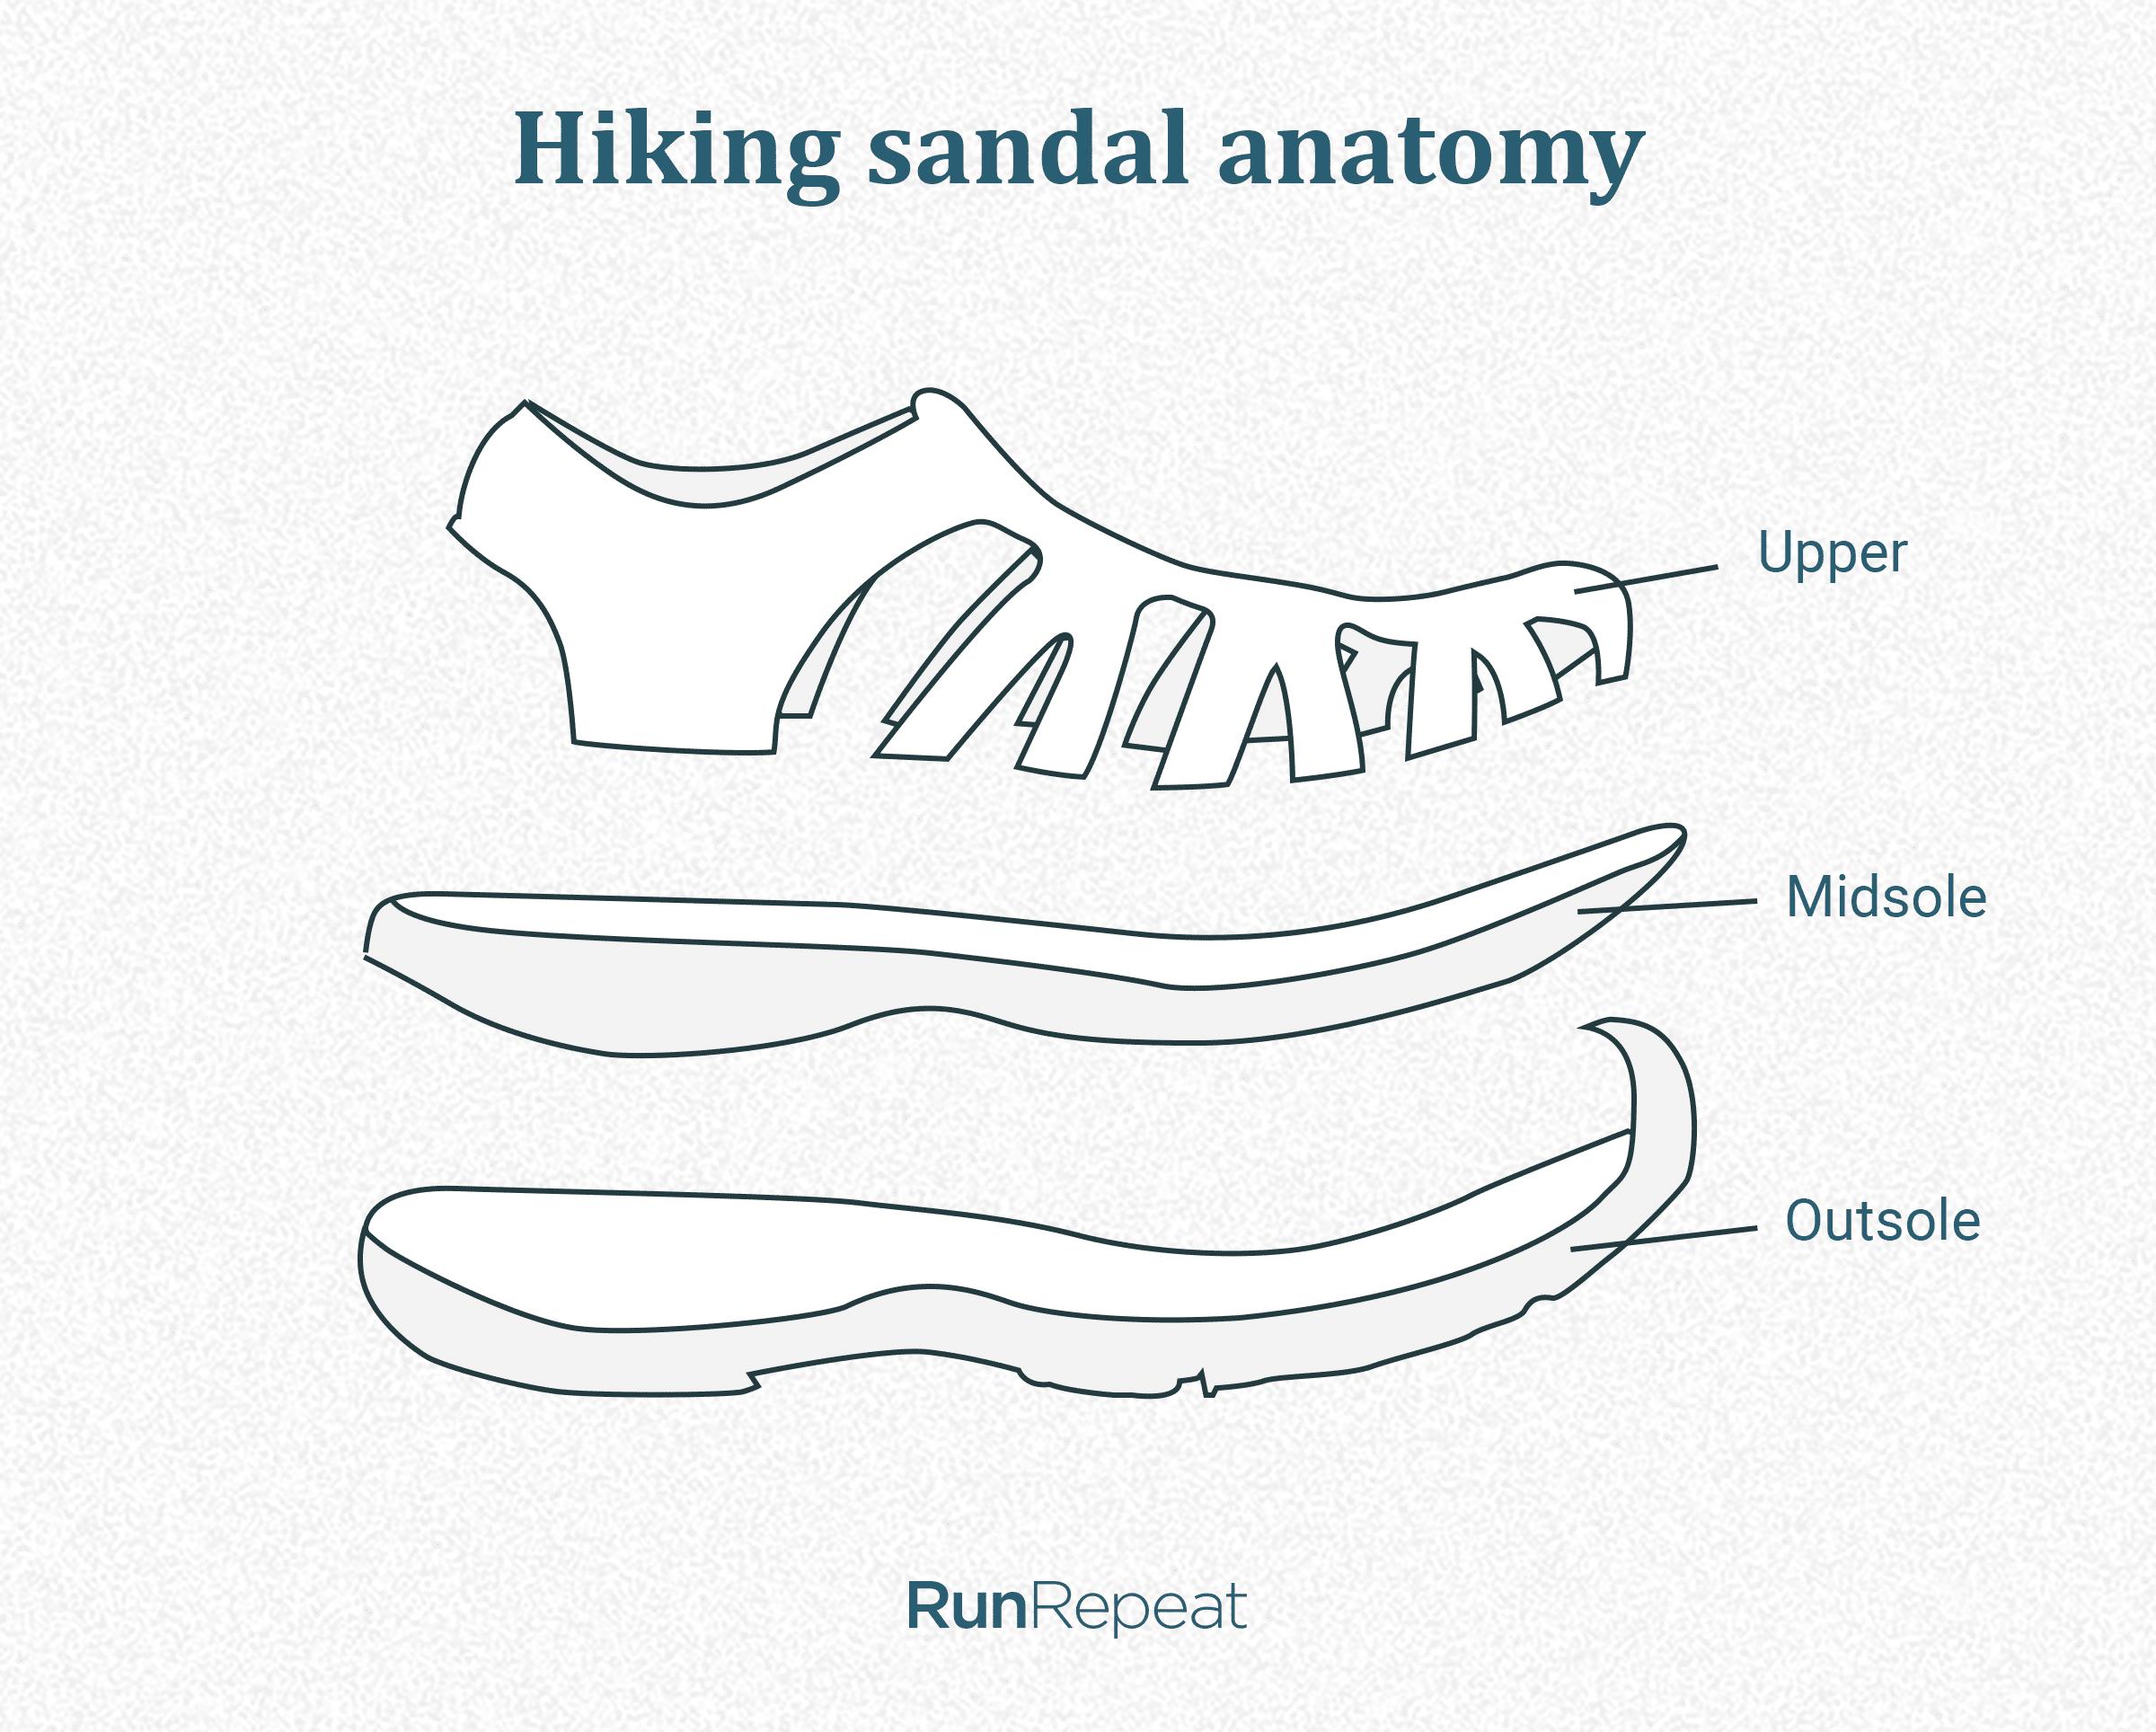 Hiking sandal anatomy.png